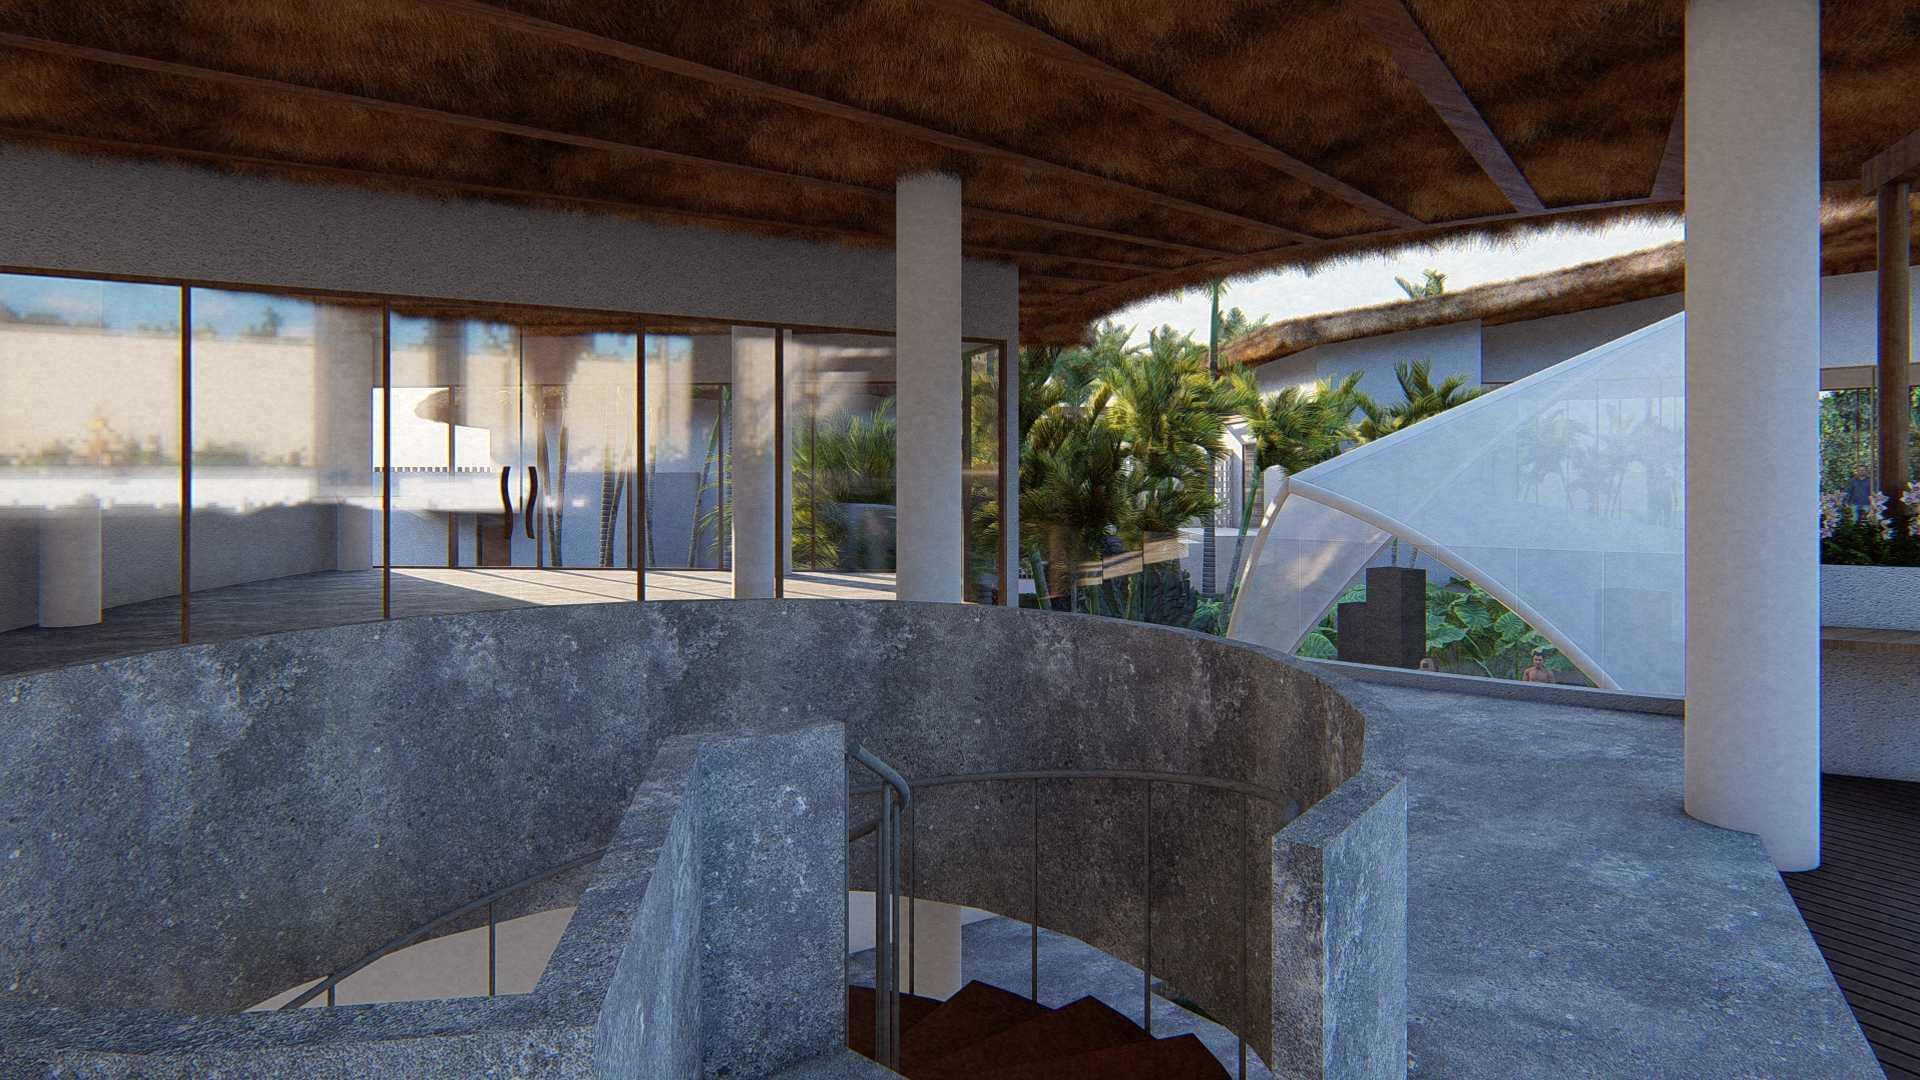 Raaj Gill Arsitek Goethe Club Canggu, Kec. Kuta Utara, Kabupaten Badung, Bali, Indonesia Bali, Indonesia Raaj-Gill-Arsitek-Studio-Bali  102254